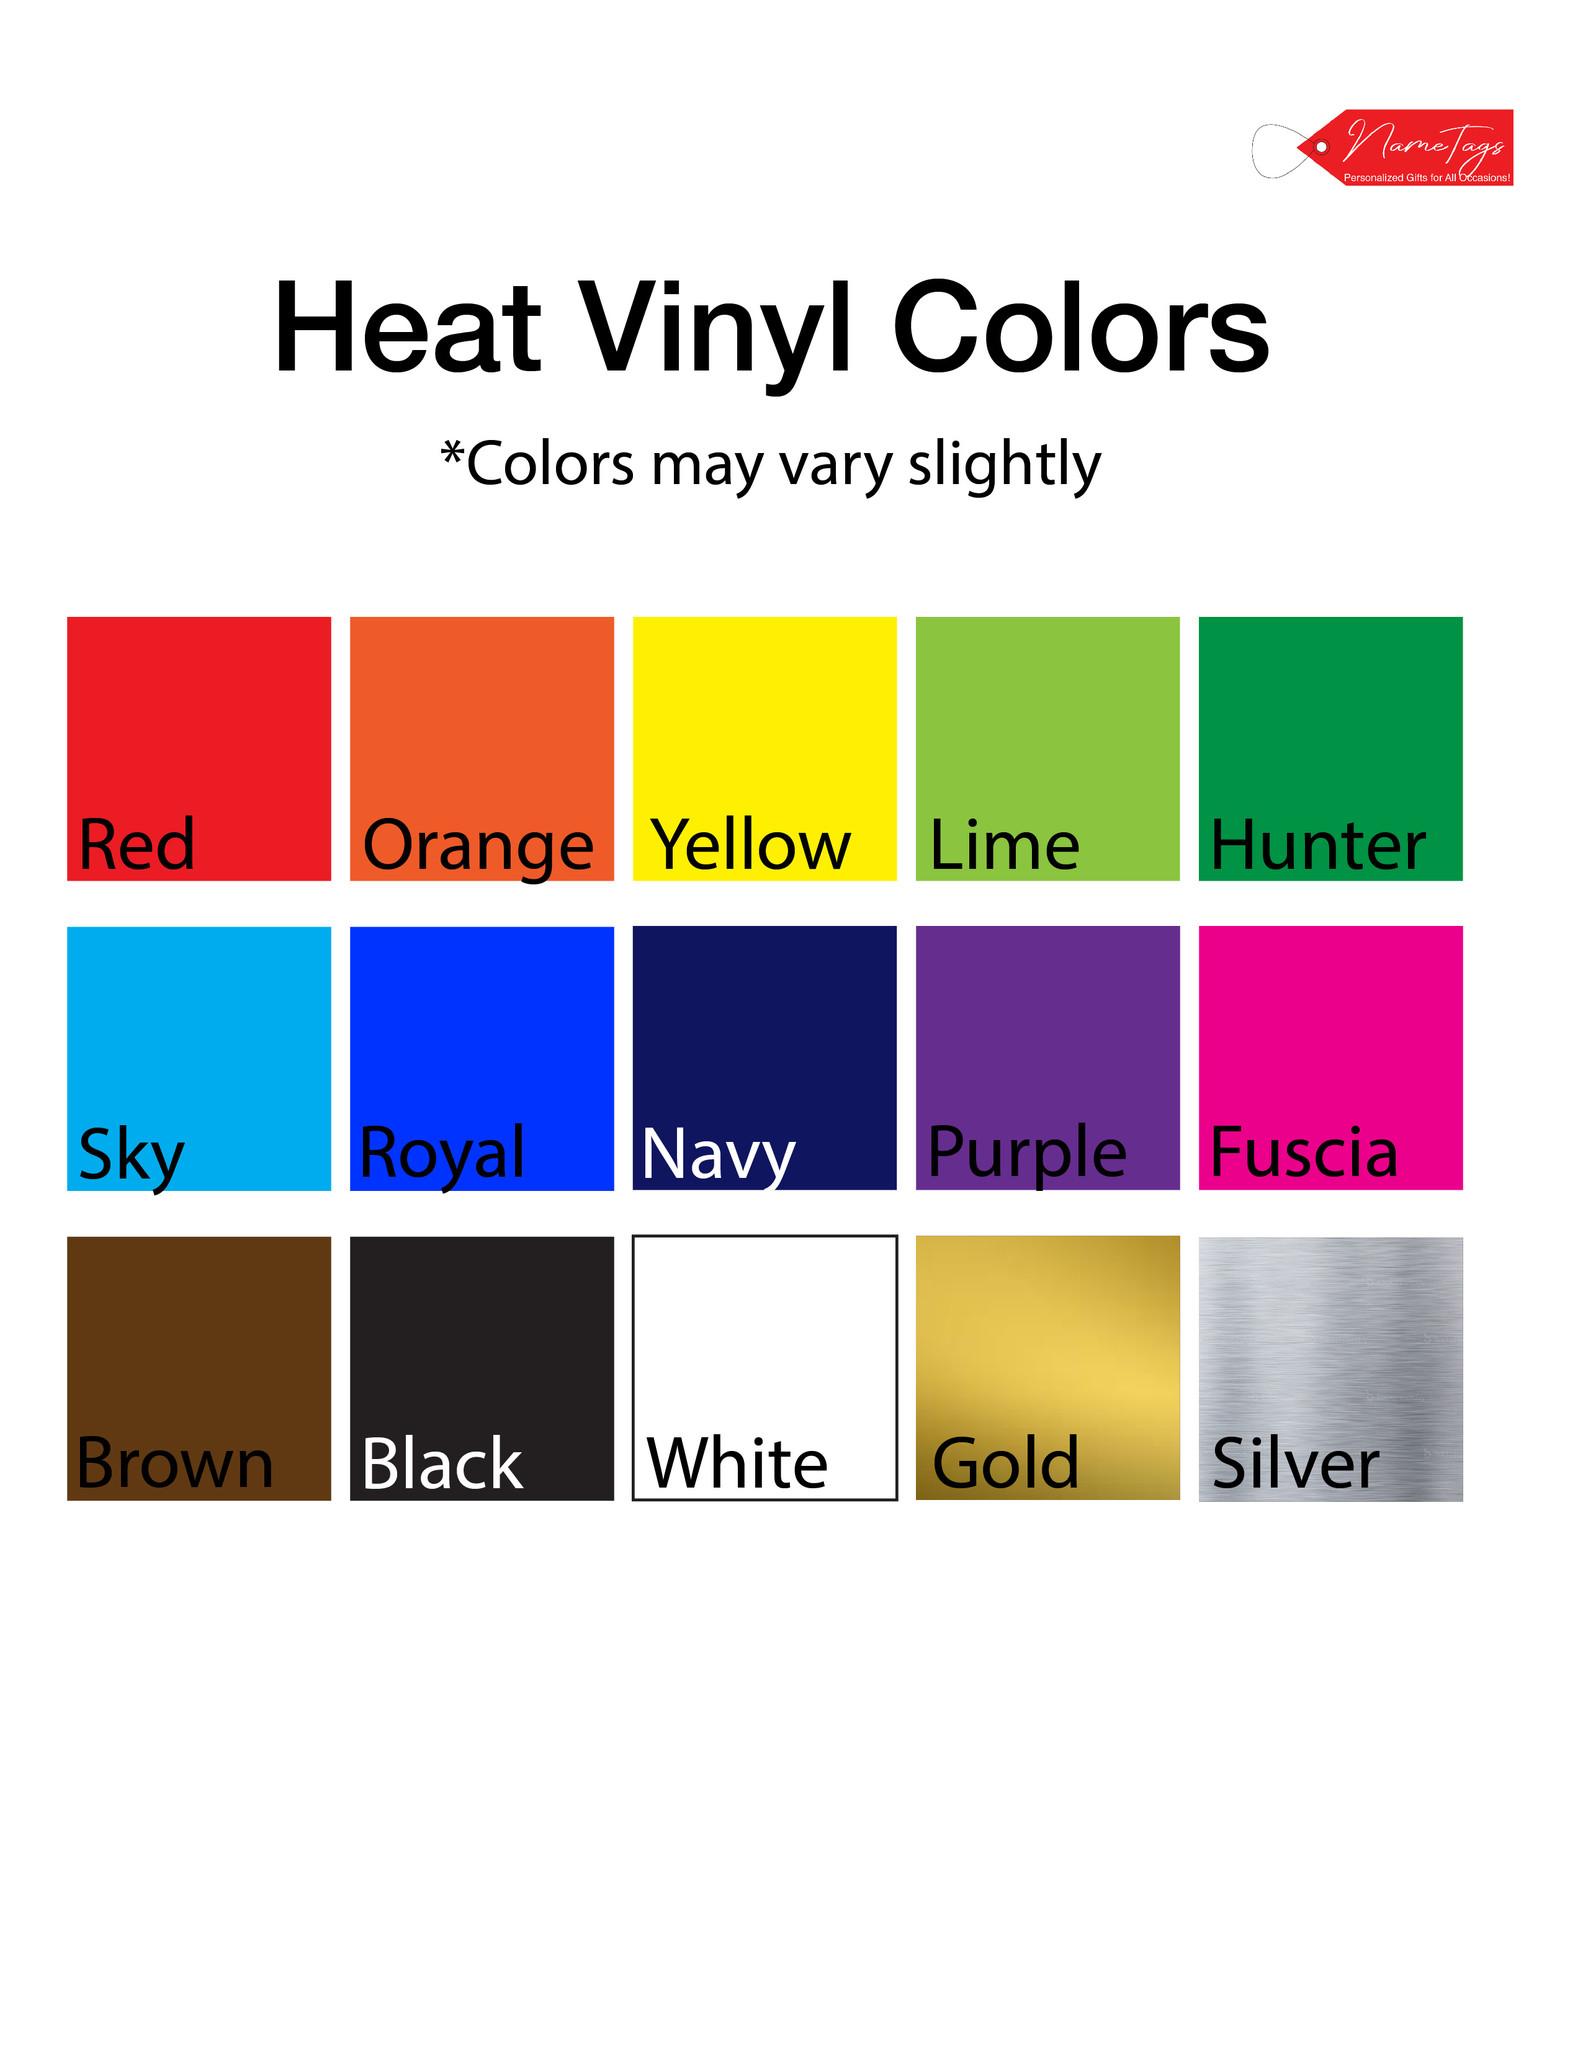 Heat Vinyl Colors